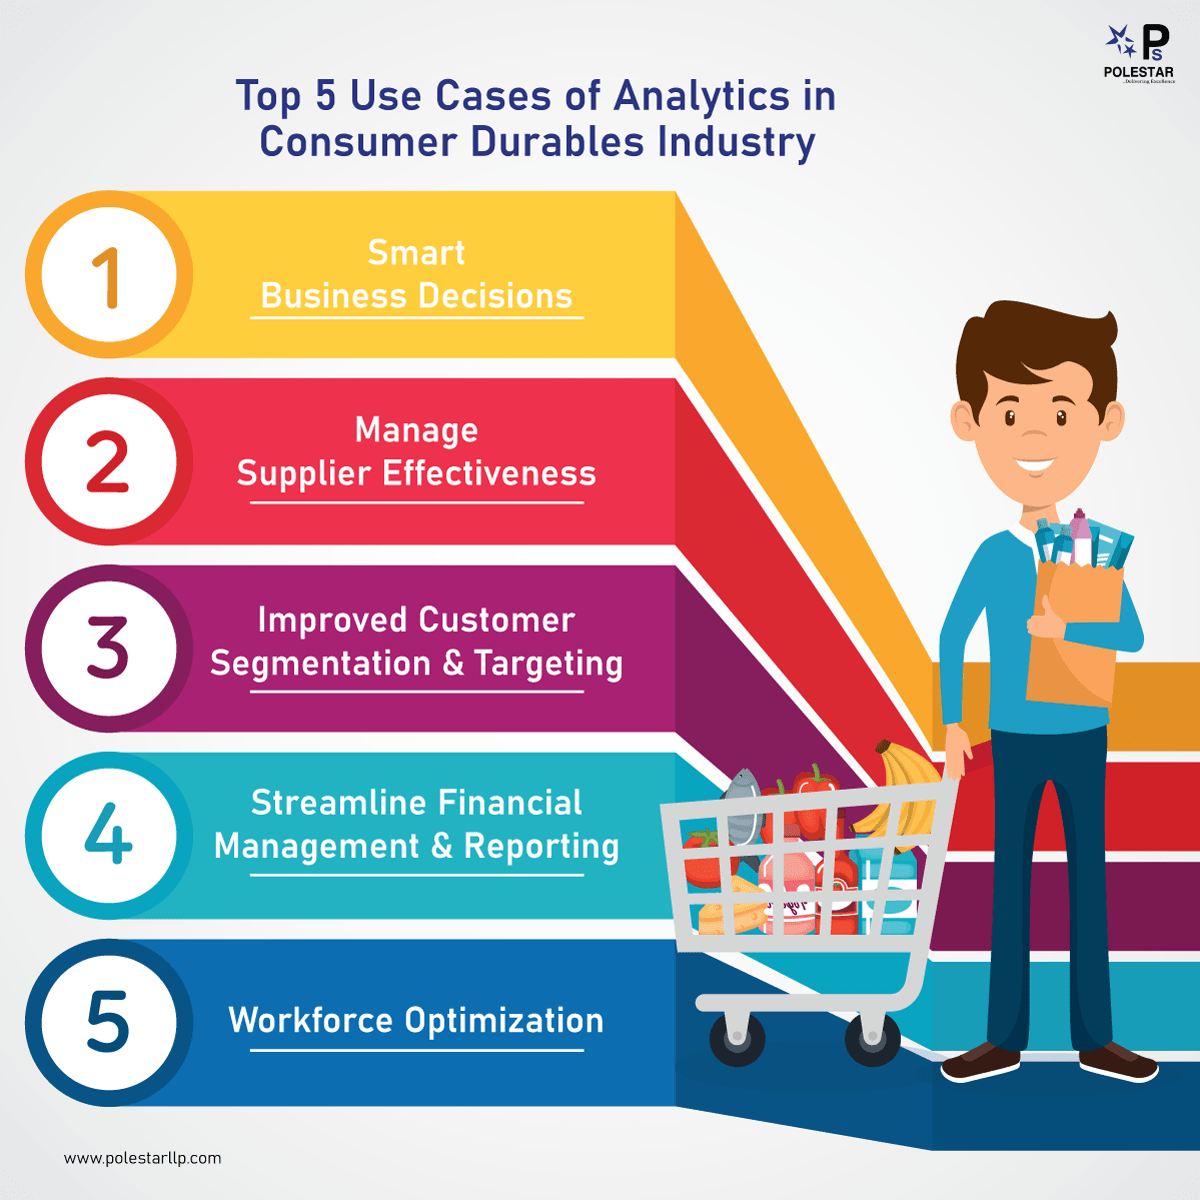 Analytics-in-Consumer-Durables-Industry